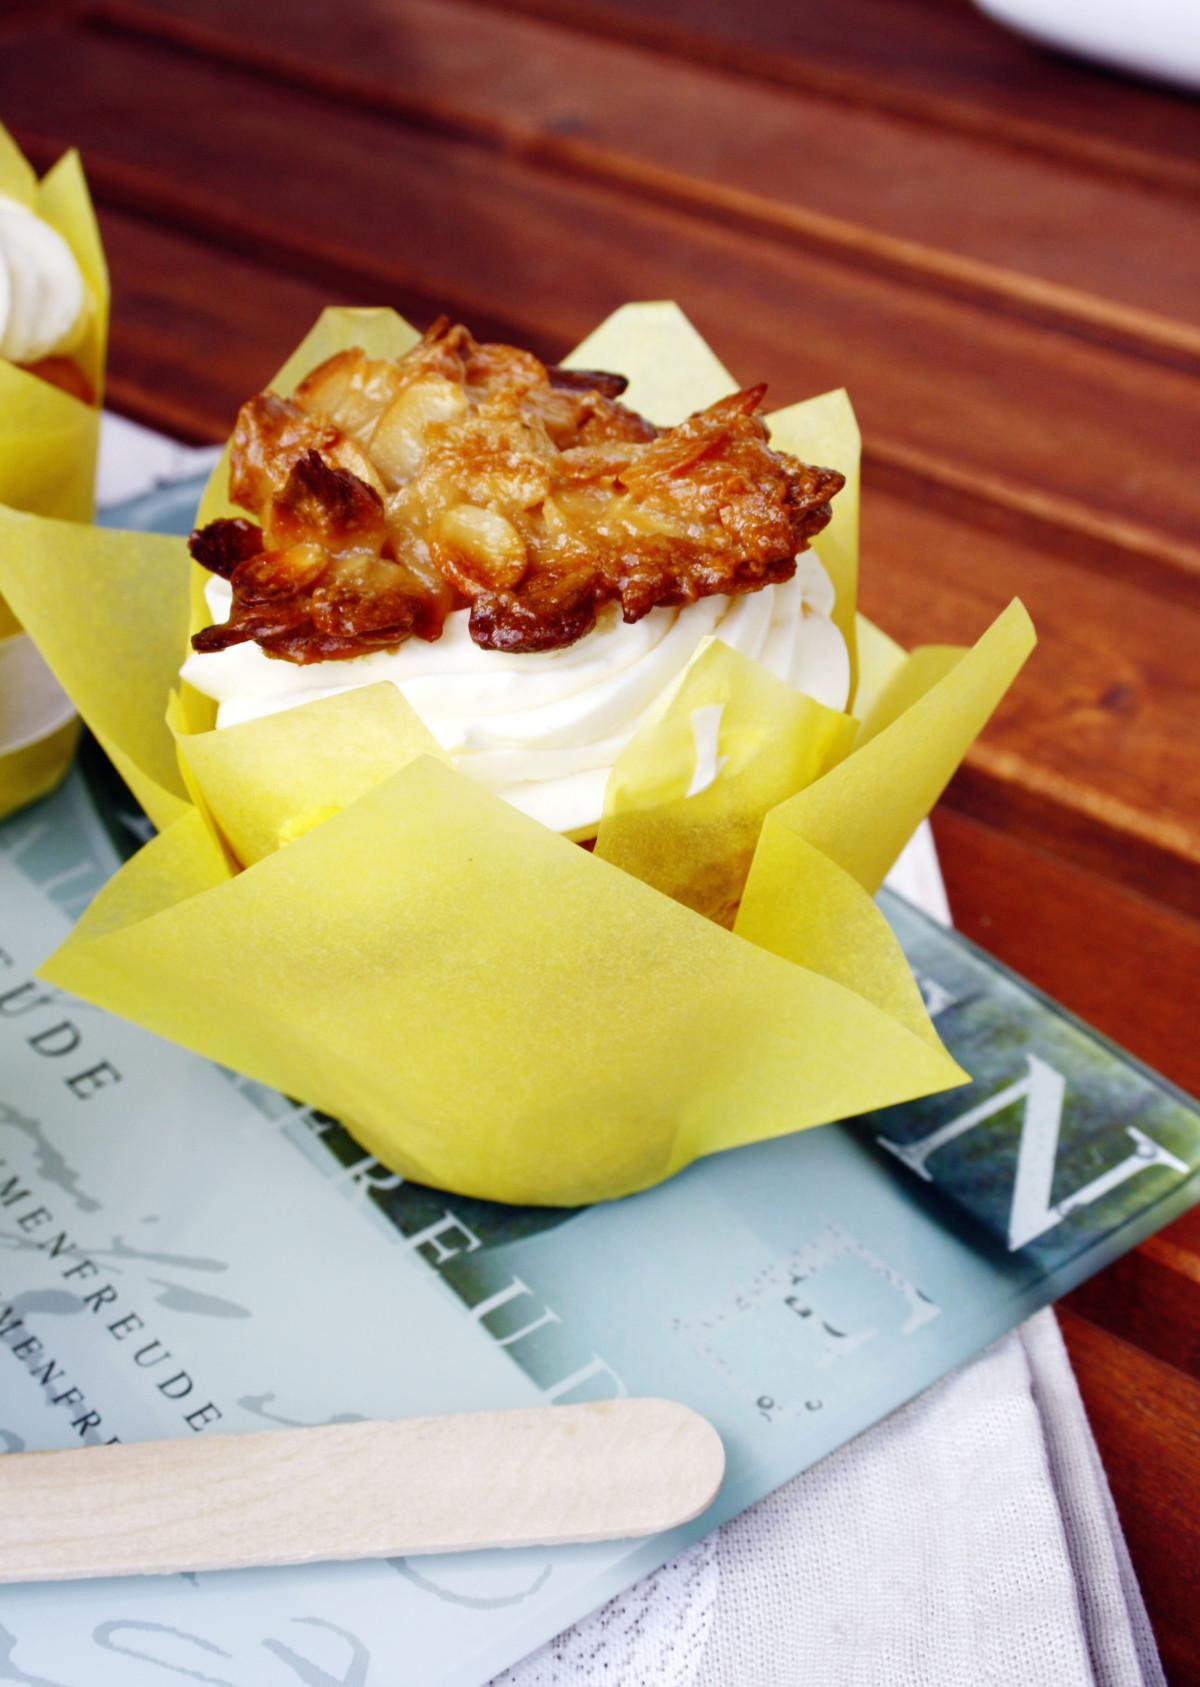 Bienenstich Cupcakes // Bee sting cake by http://babyrockmyday.com/bienenstich-cupcakes/